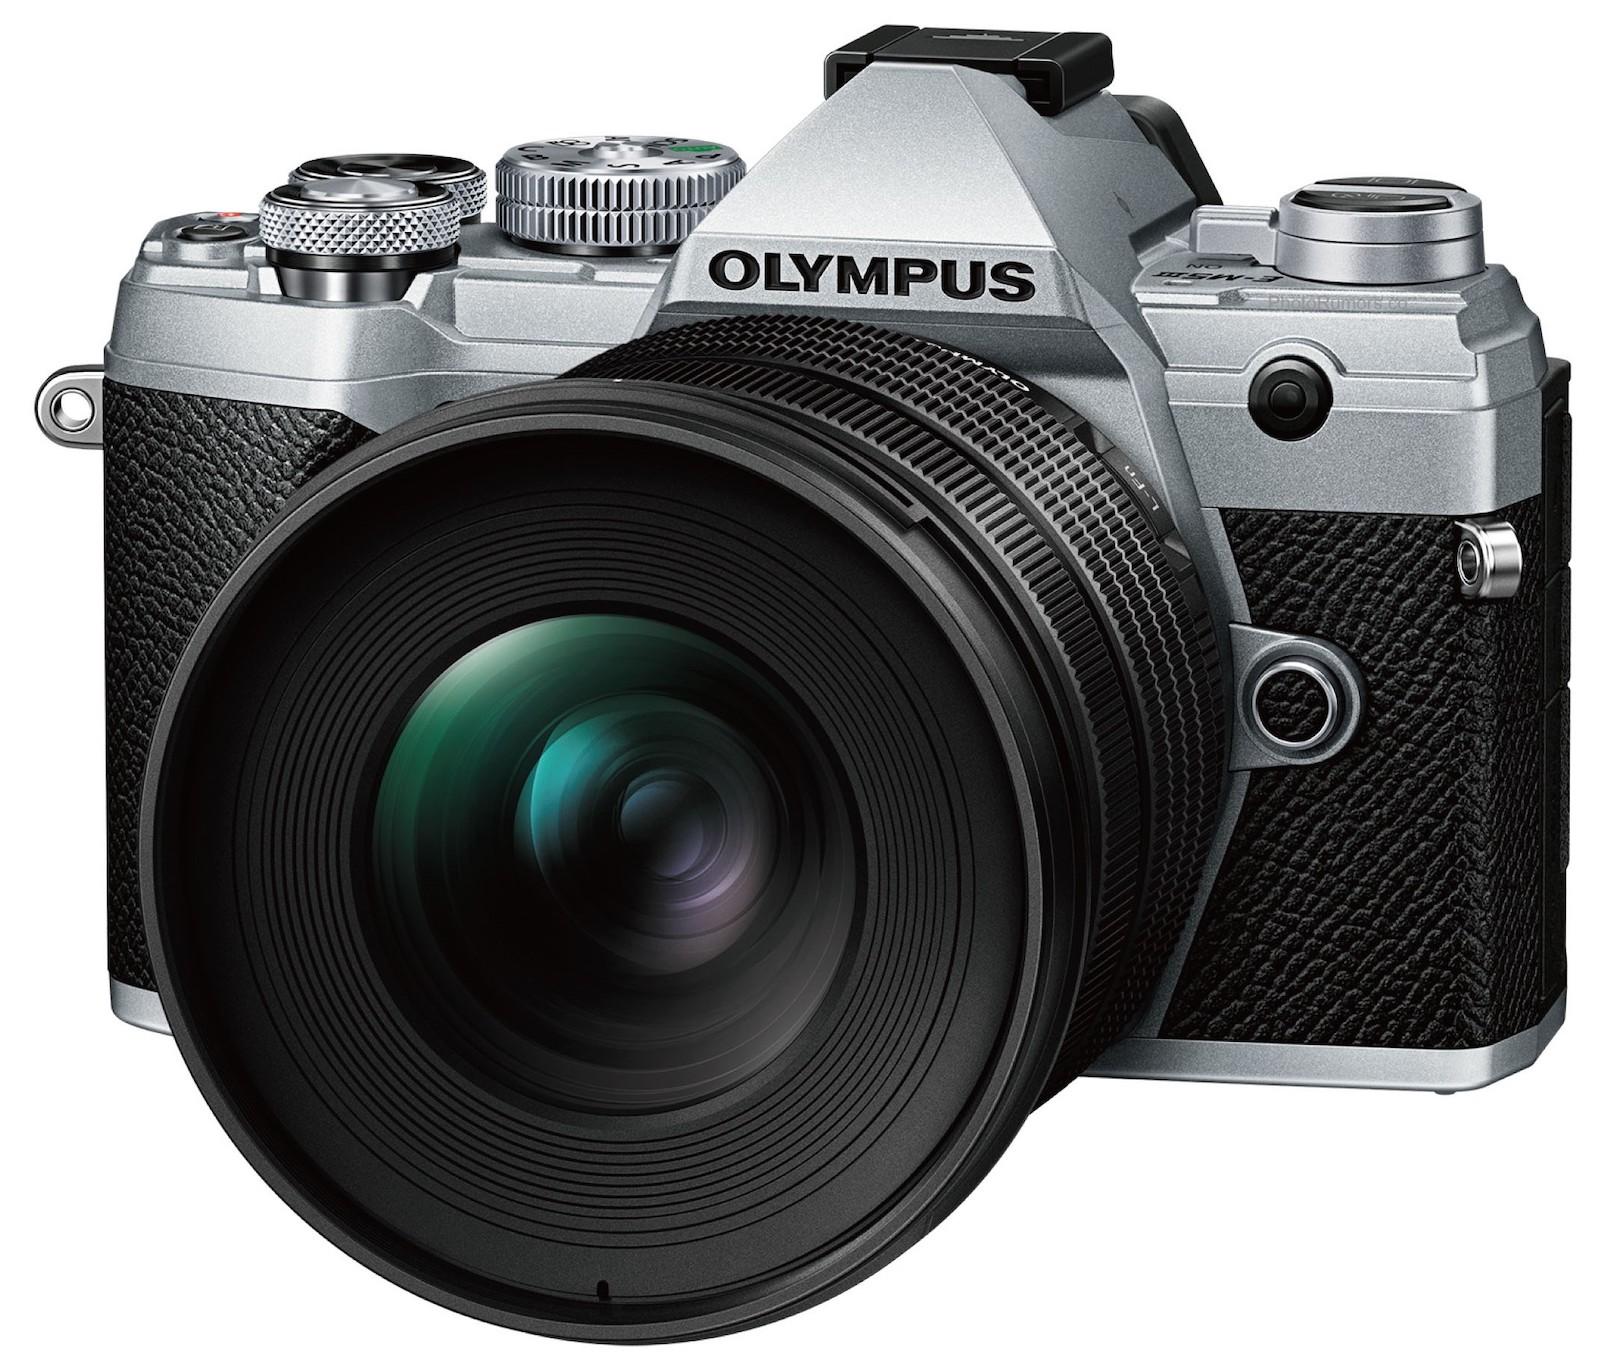 Olympus M.Zuiko Digital 8-25mm f/4 Pro с камерой Olympus